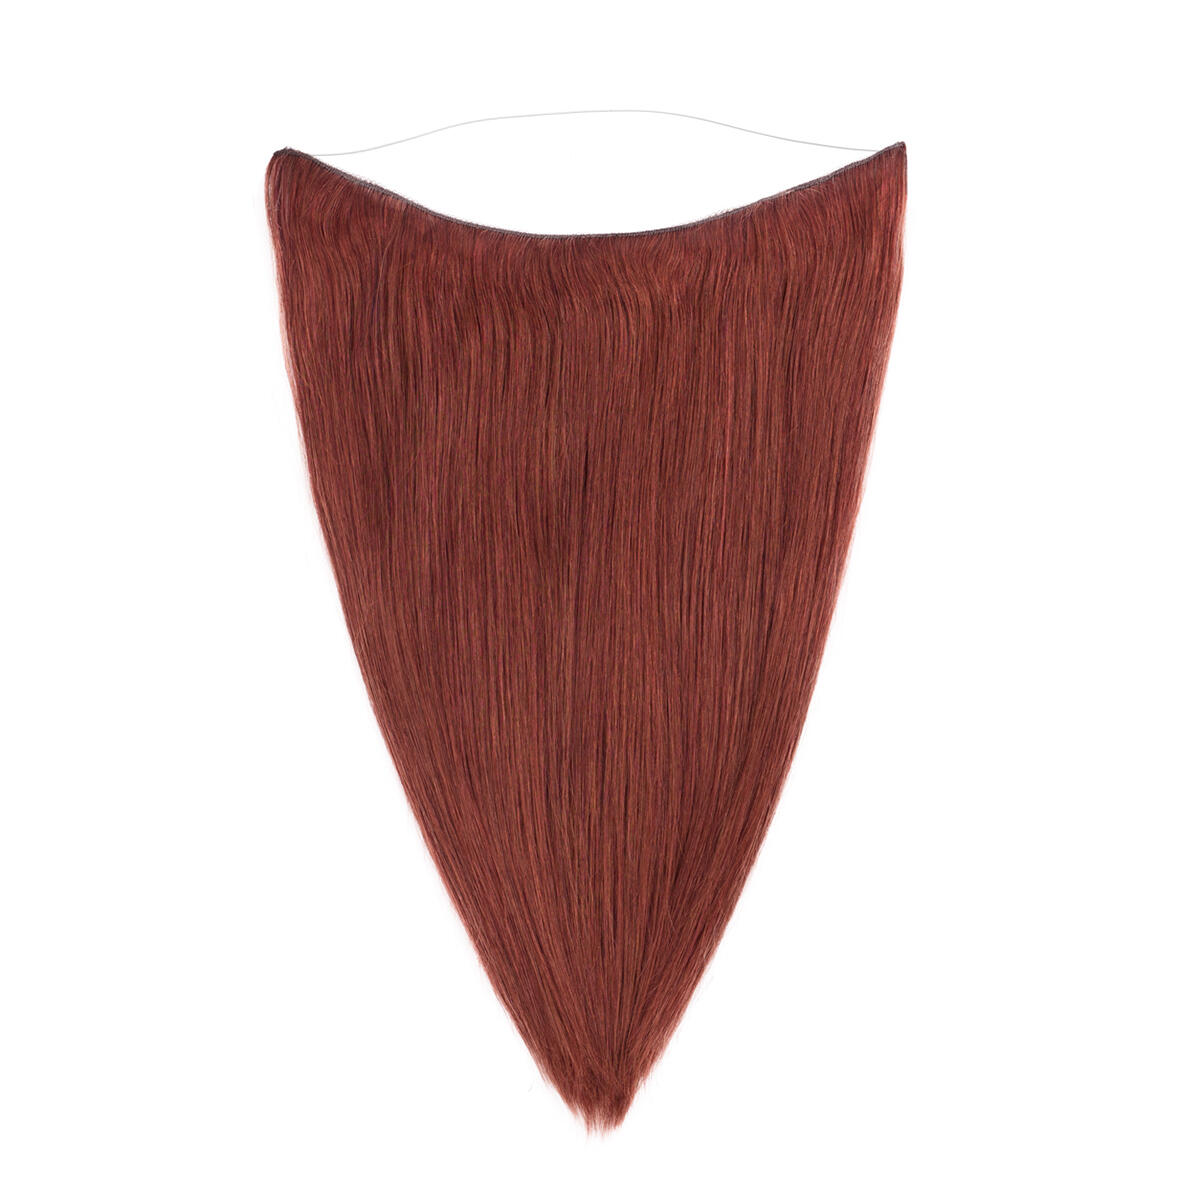 Hairband Original 5.5 Mahogany Brown 45 cm